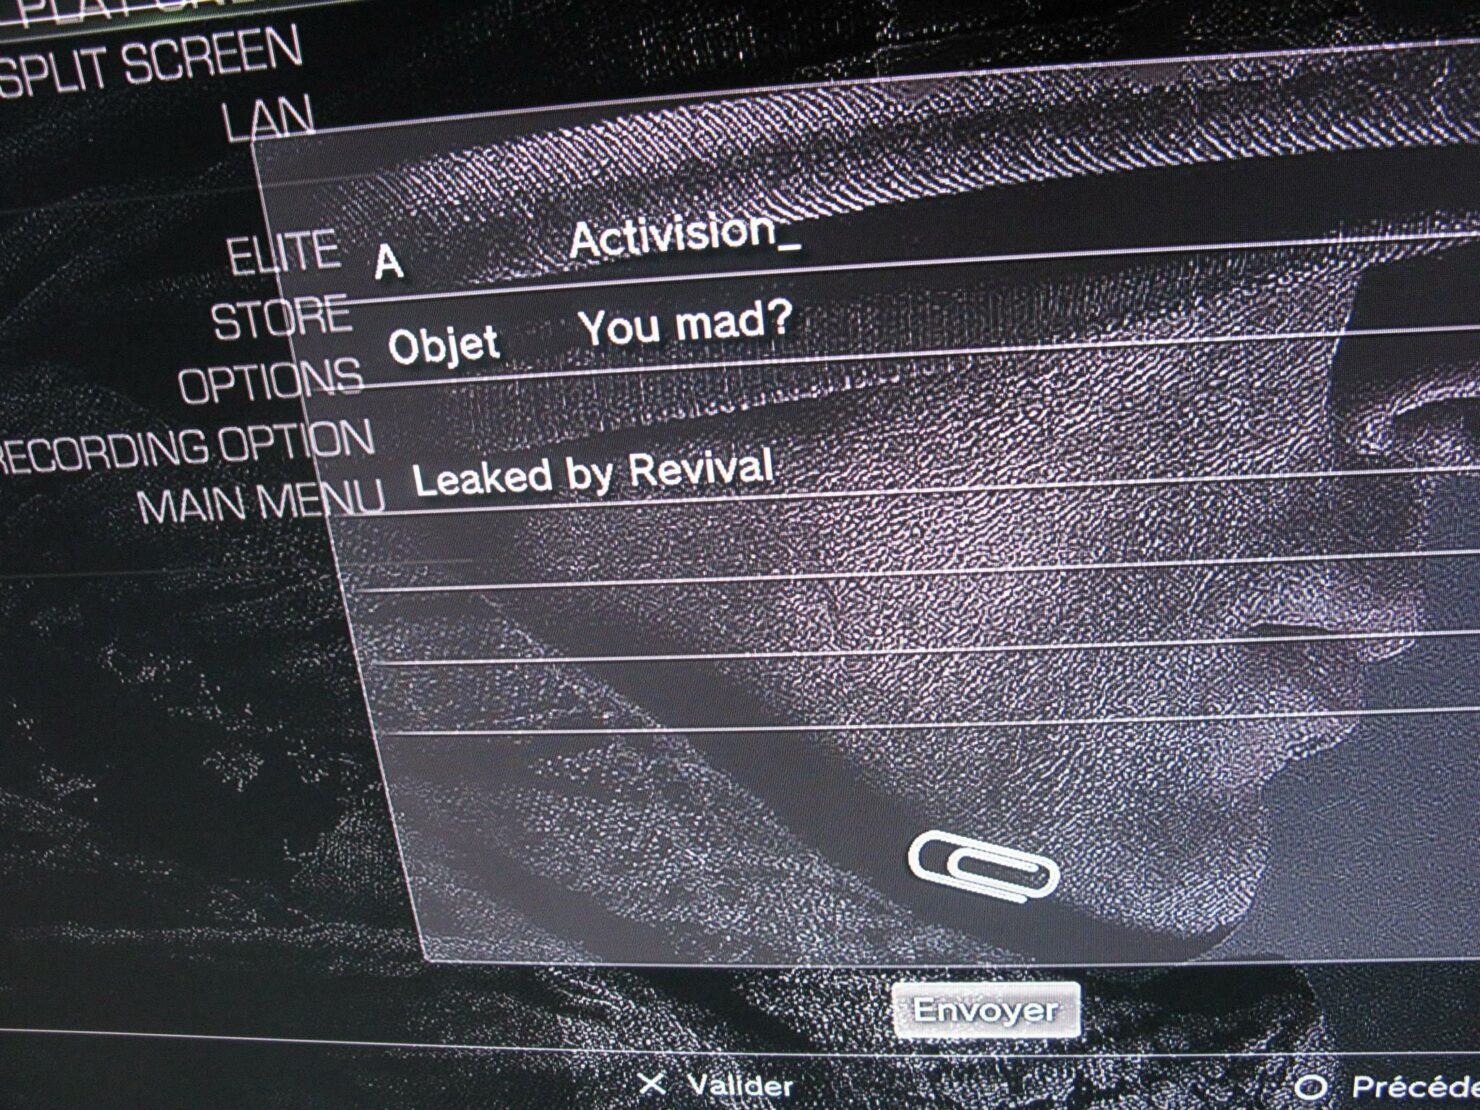 Call of Duty: Ghost Leak_1